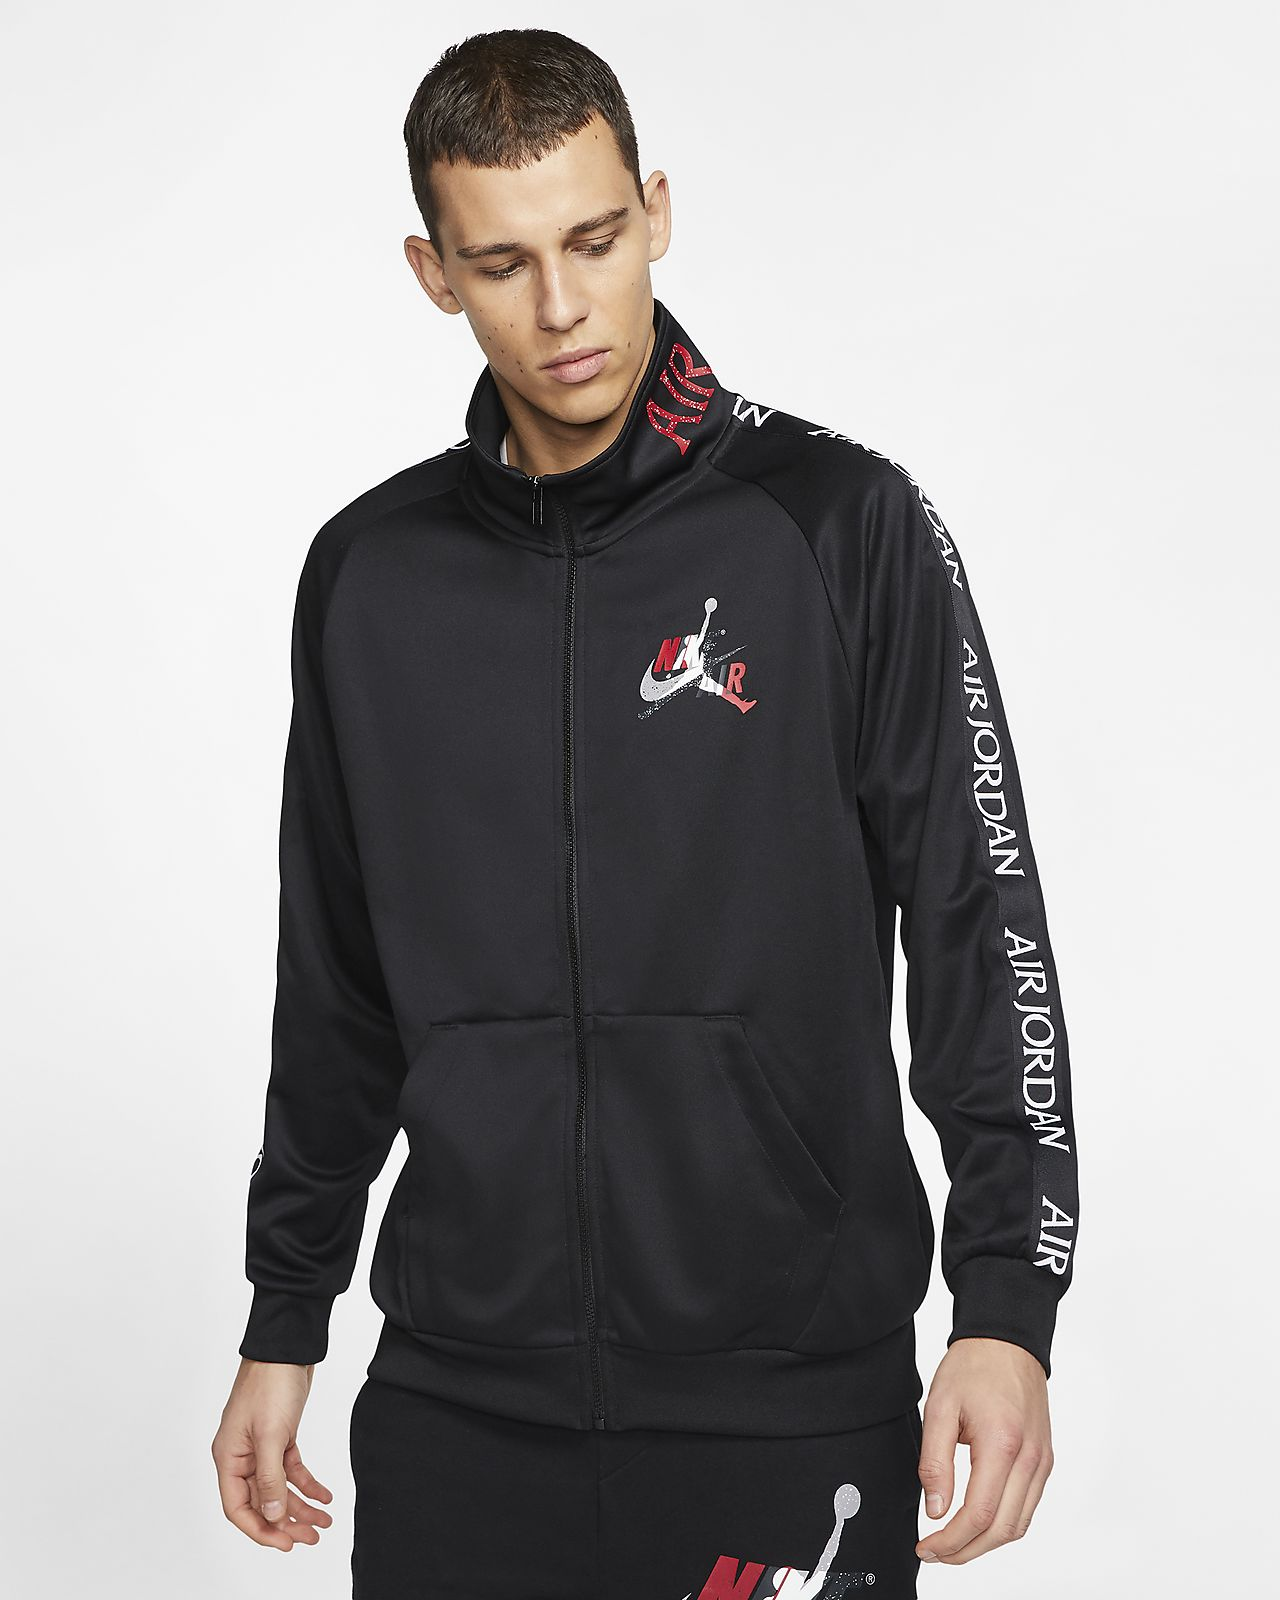 Herren Nike Sportkleidung Air Max Trainingsjacke Größe 2XL